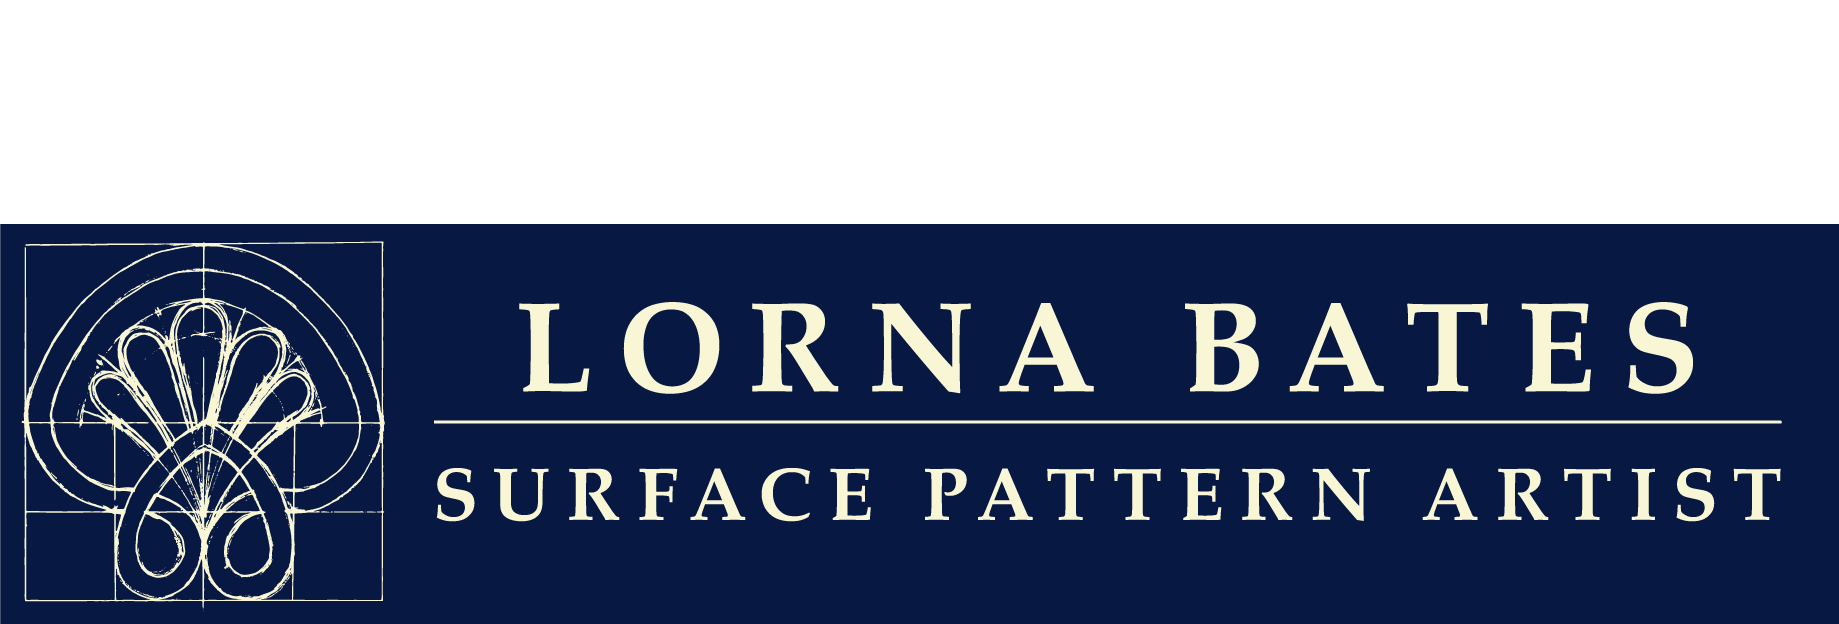 Lorna Bates - Surface Pattern Artist